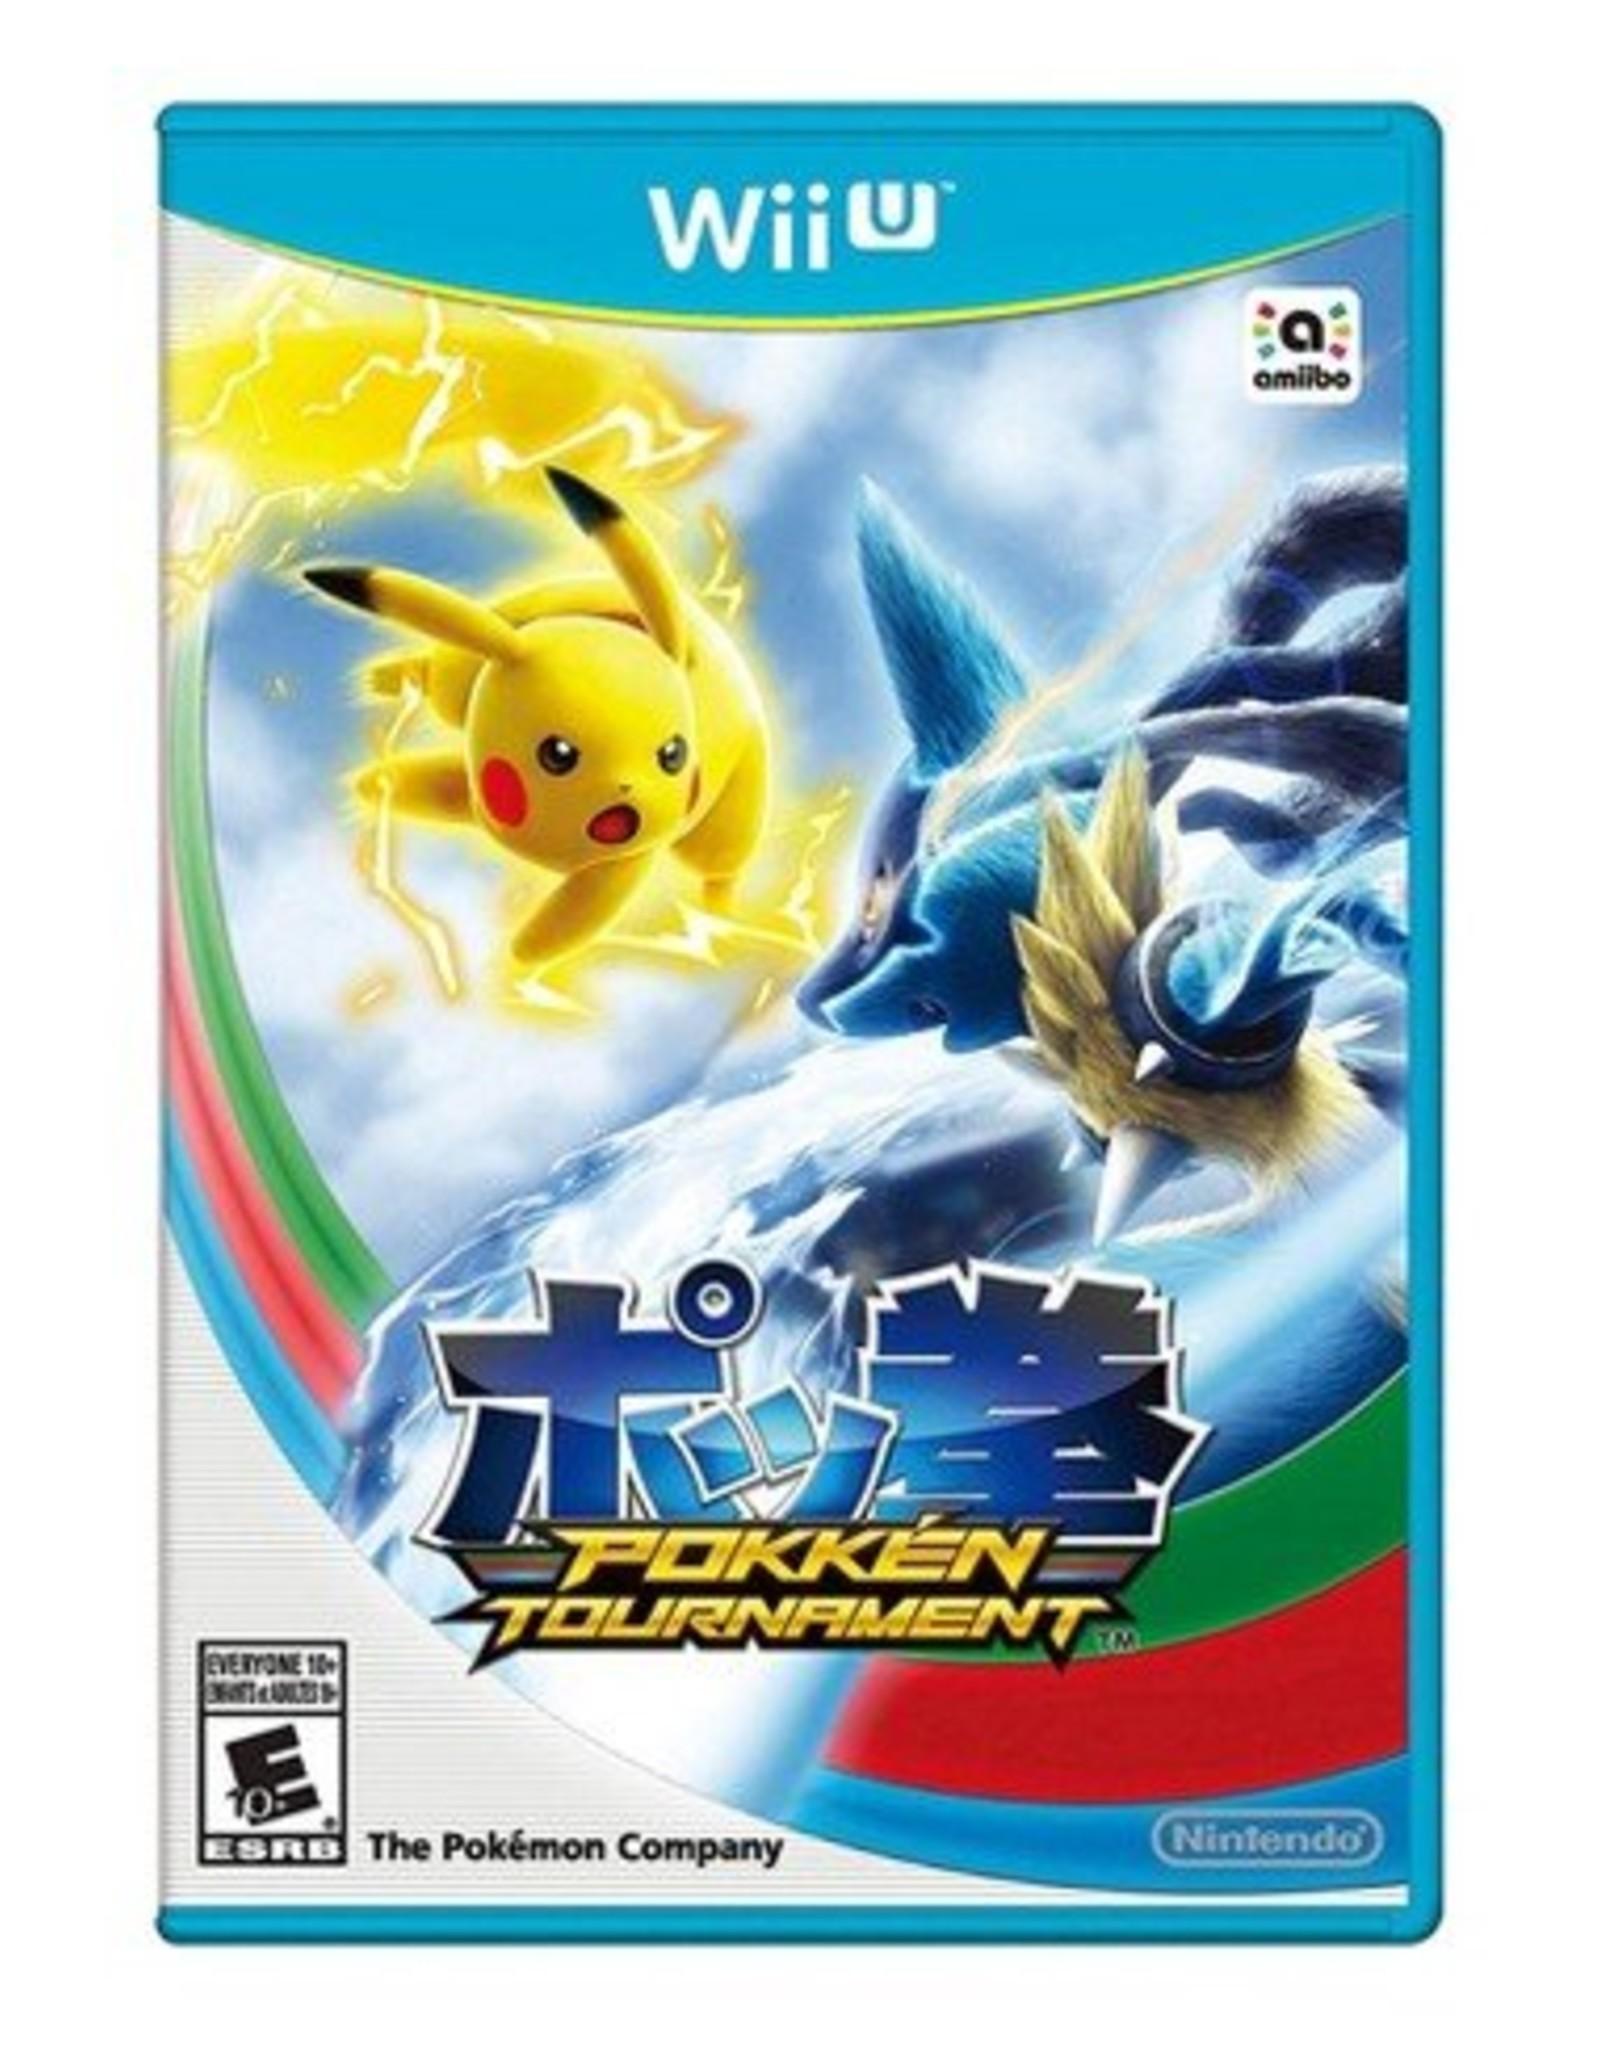 Pokken Tournament - WIIU NEW